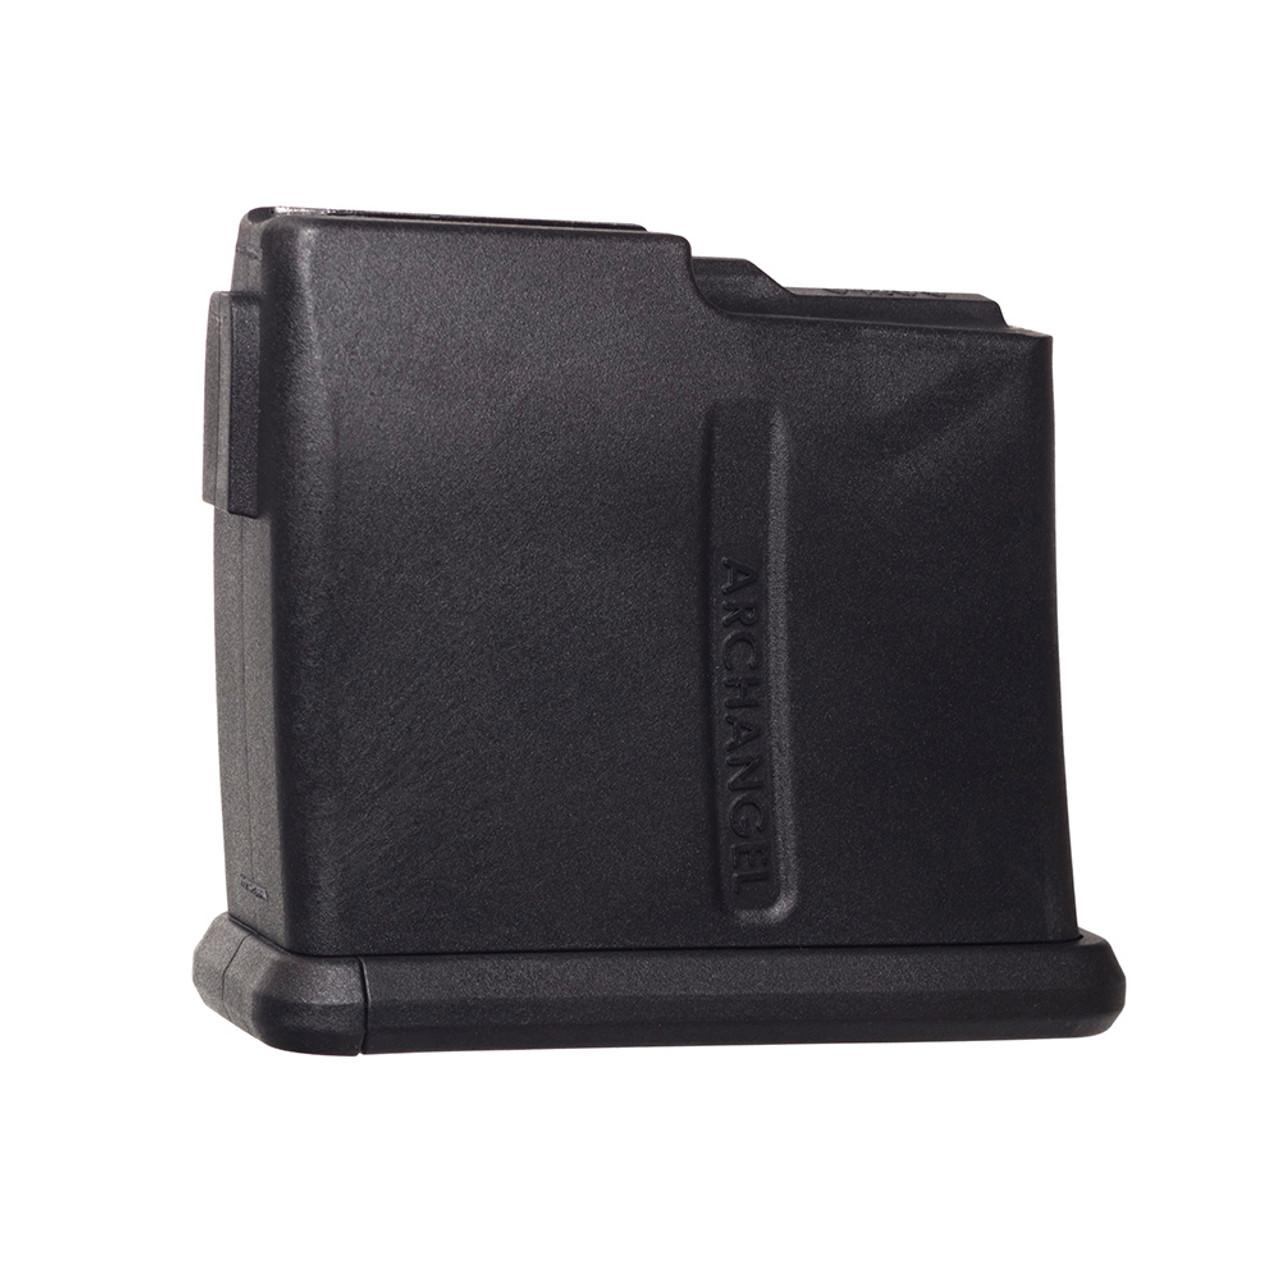 Archangel® Standard Caliber 30-06, .270, 25-06 TYPE C Magazine for AA700SLA & AA1500SLA Stocks (10) Rd - Black Polymer